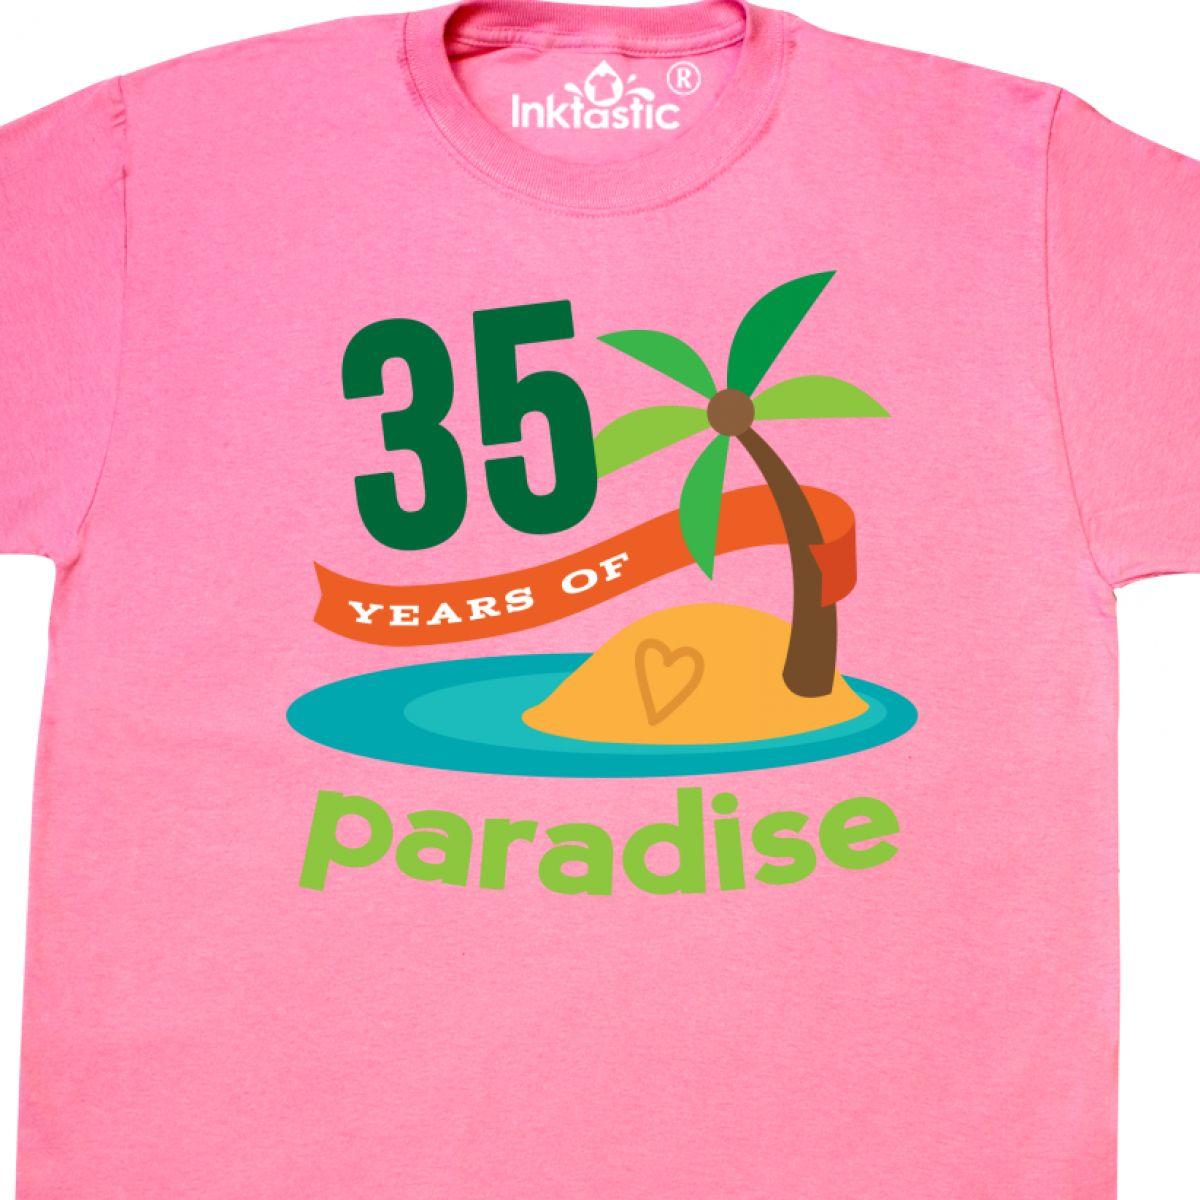 Inktastic 35th Anniversary Paradise T-Shirt 35 Year Wedding Tropical Hawaiian